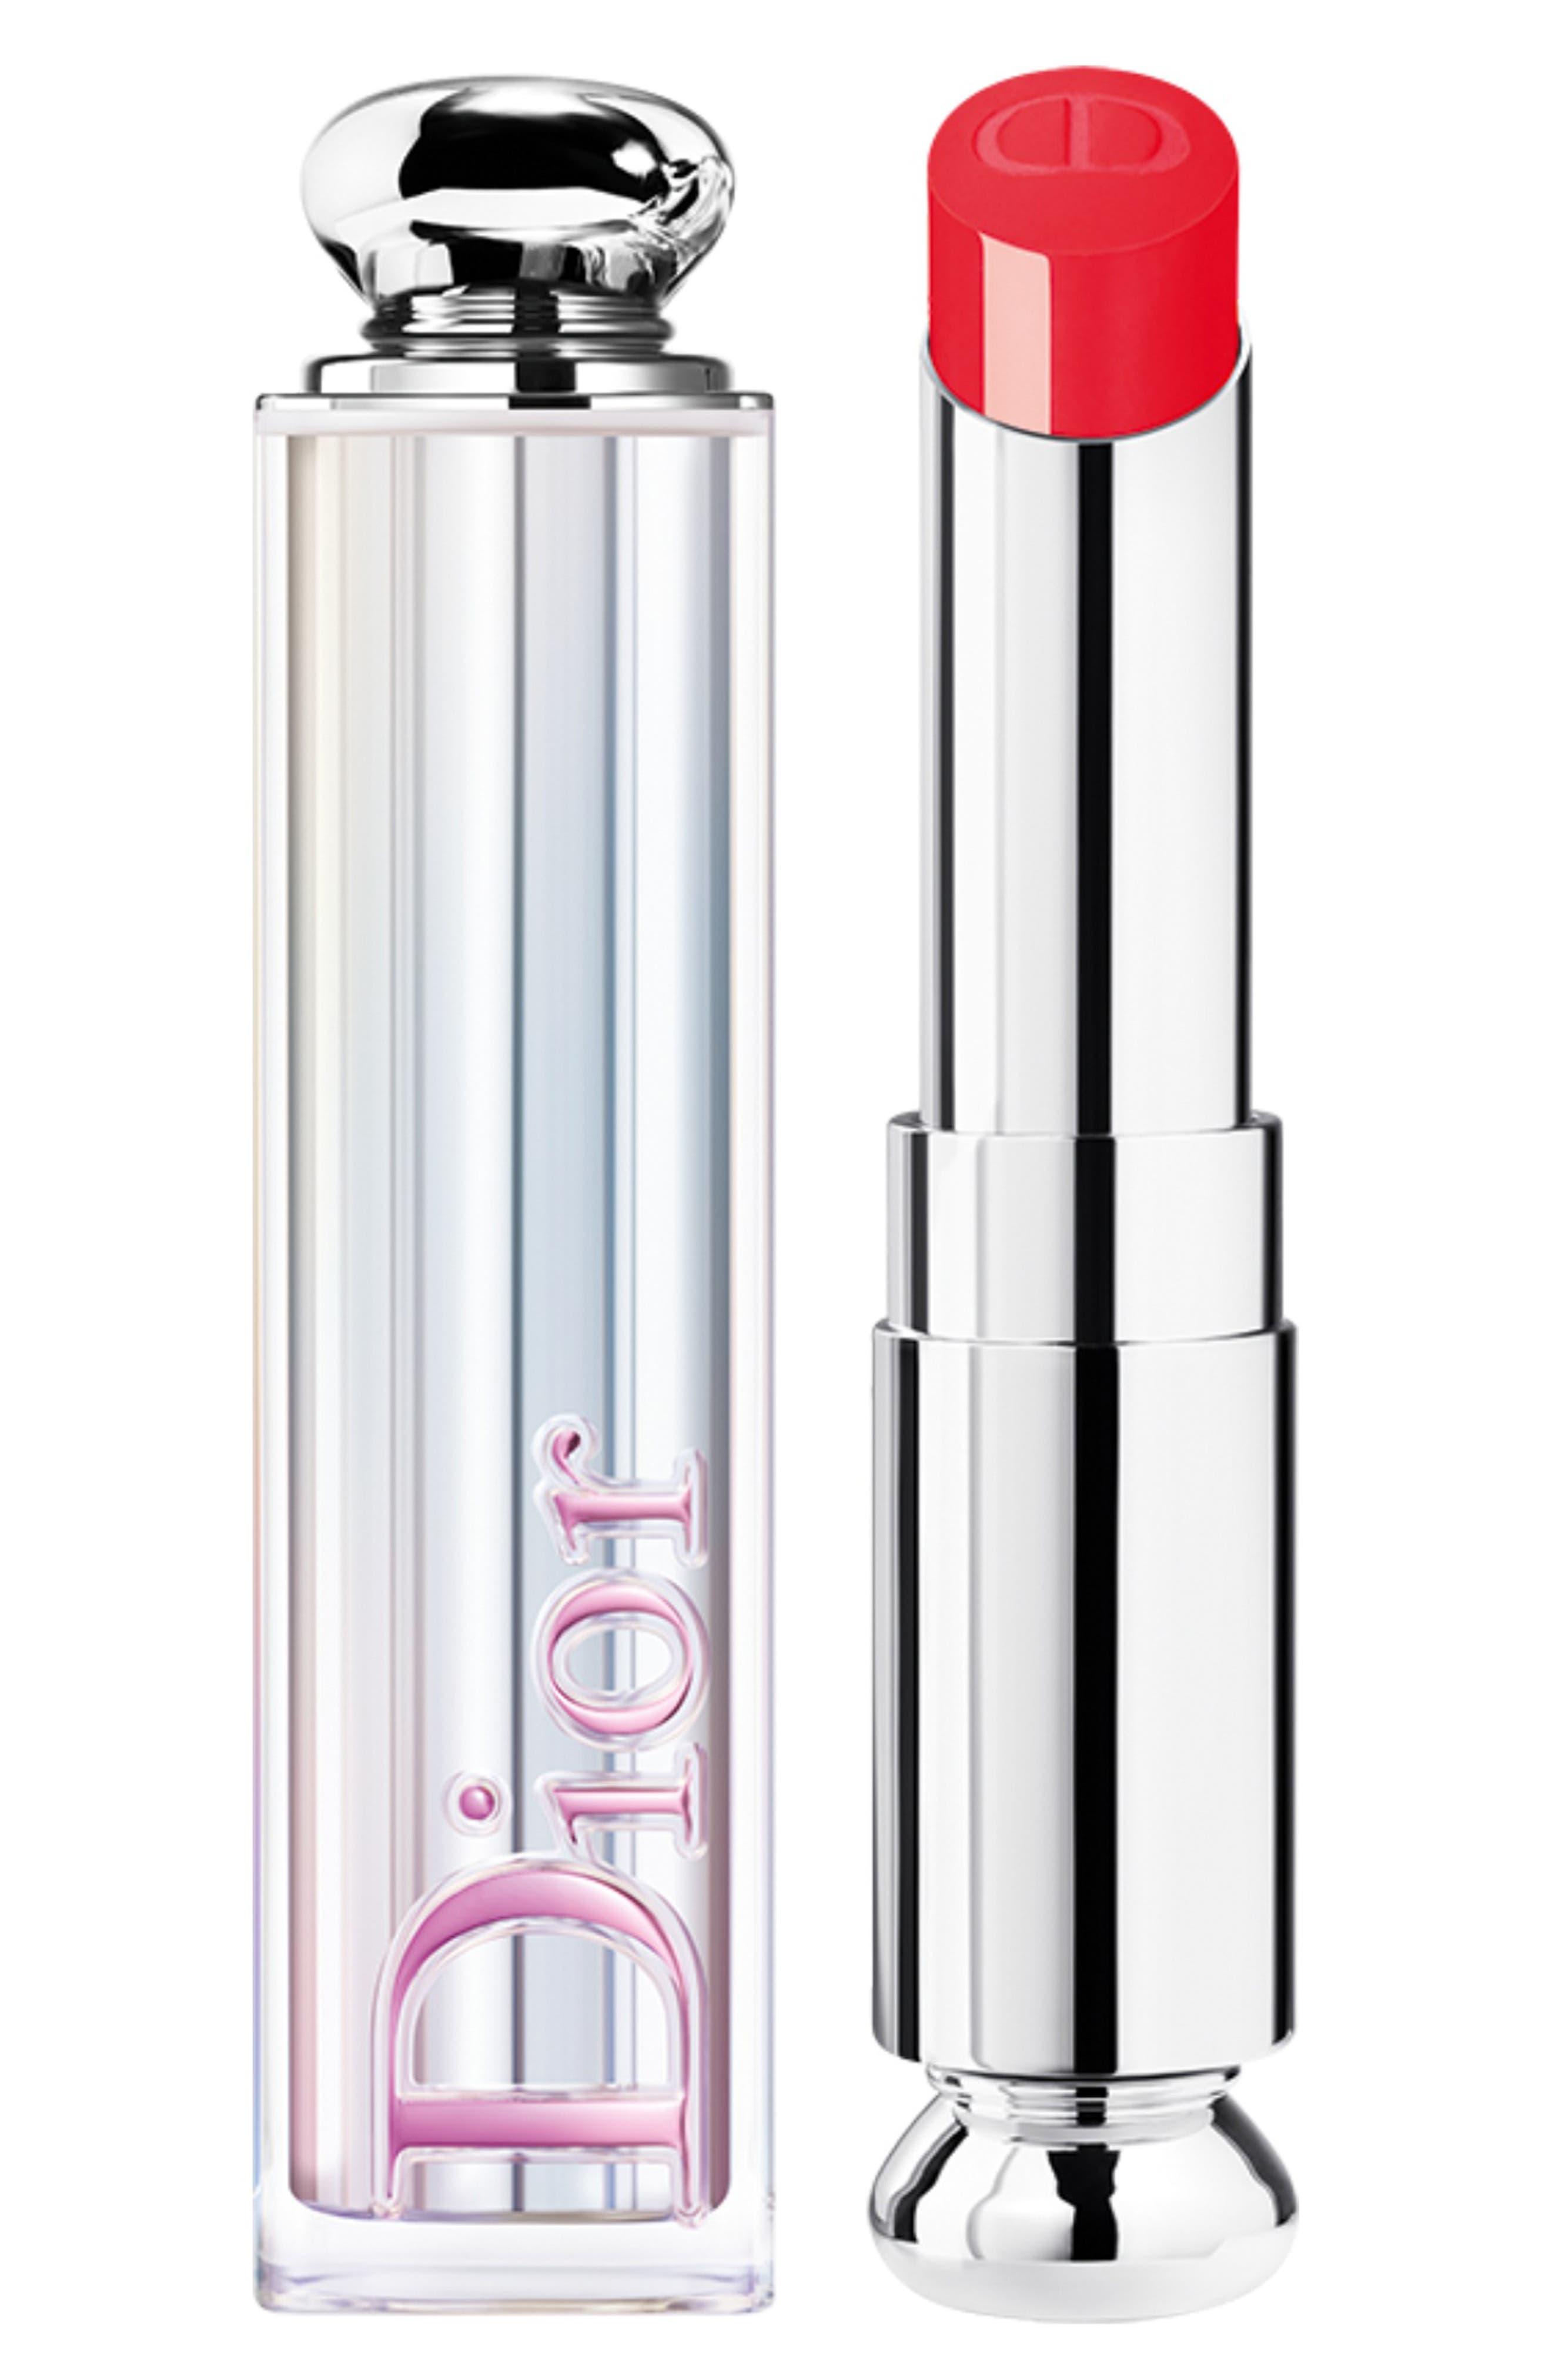 Dior Addict Stellar Shine Lipstick - 536 Lucky